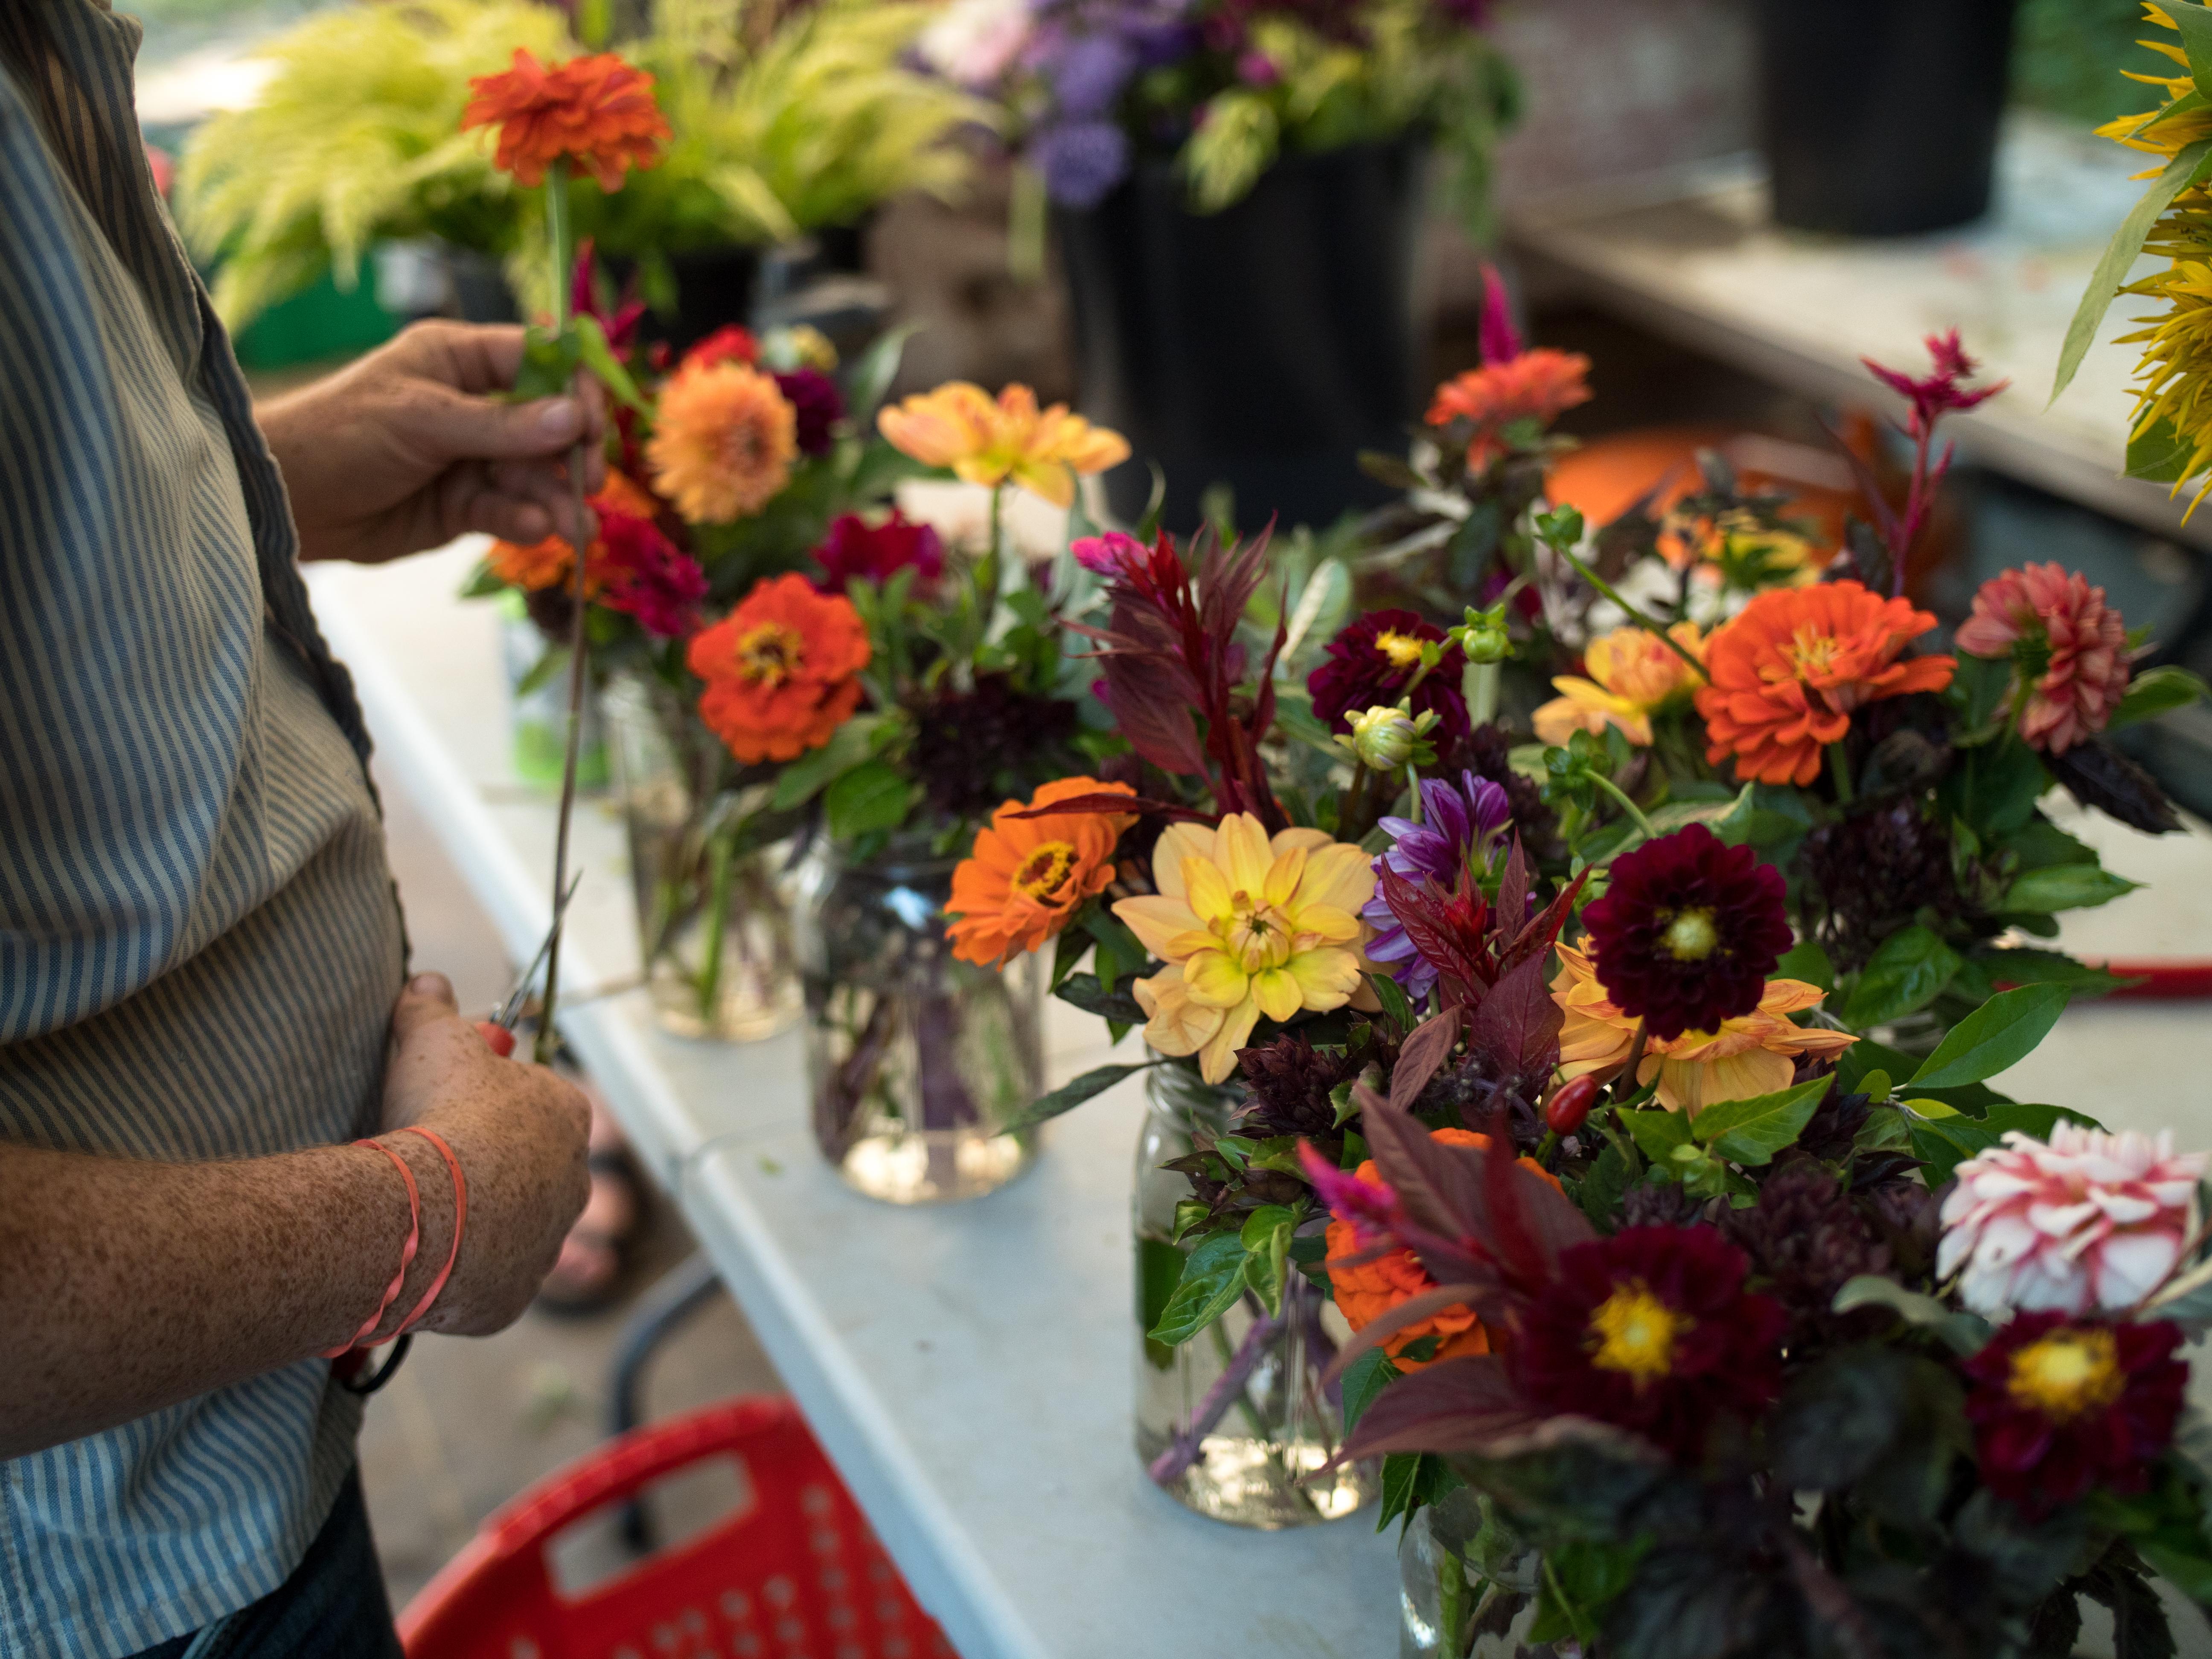 csa flowers 2